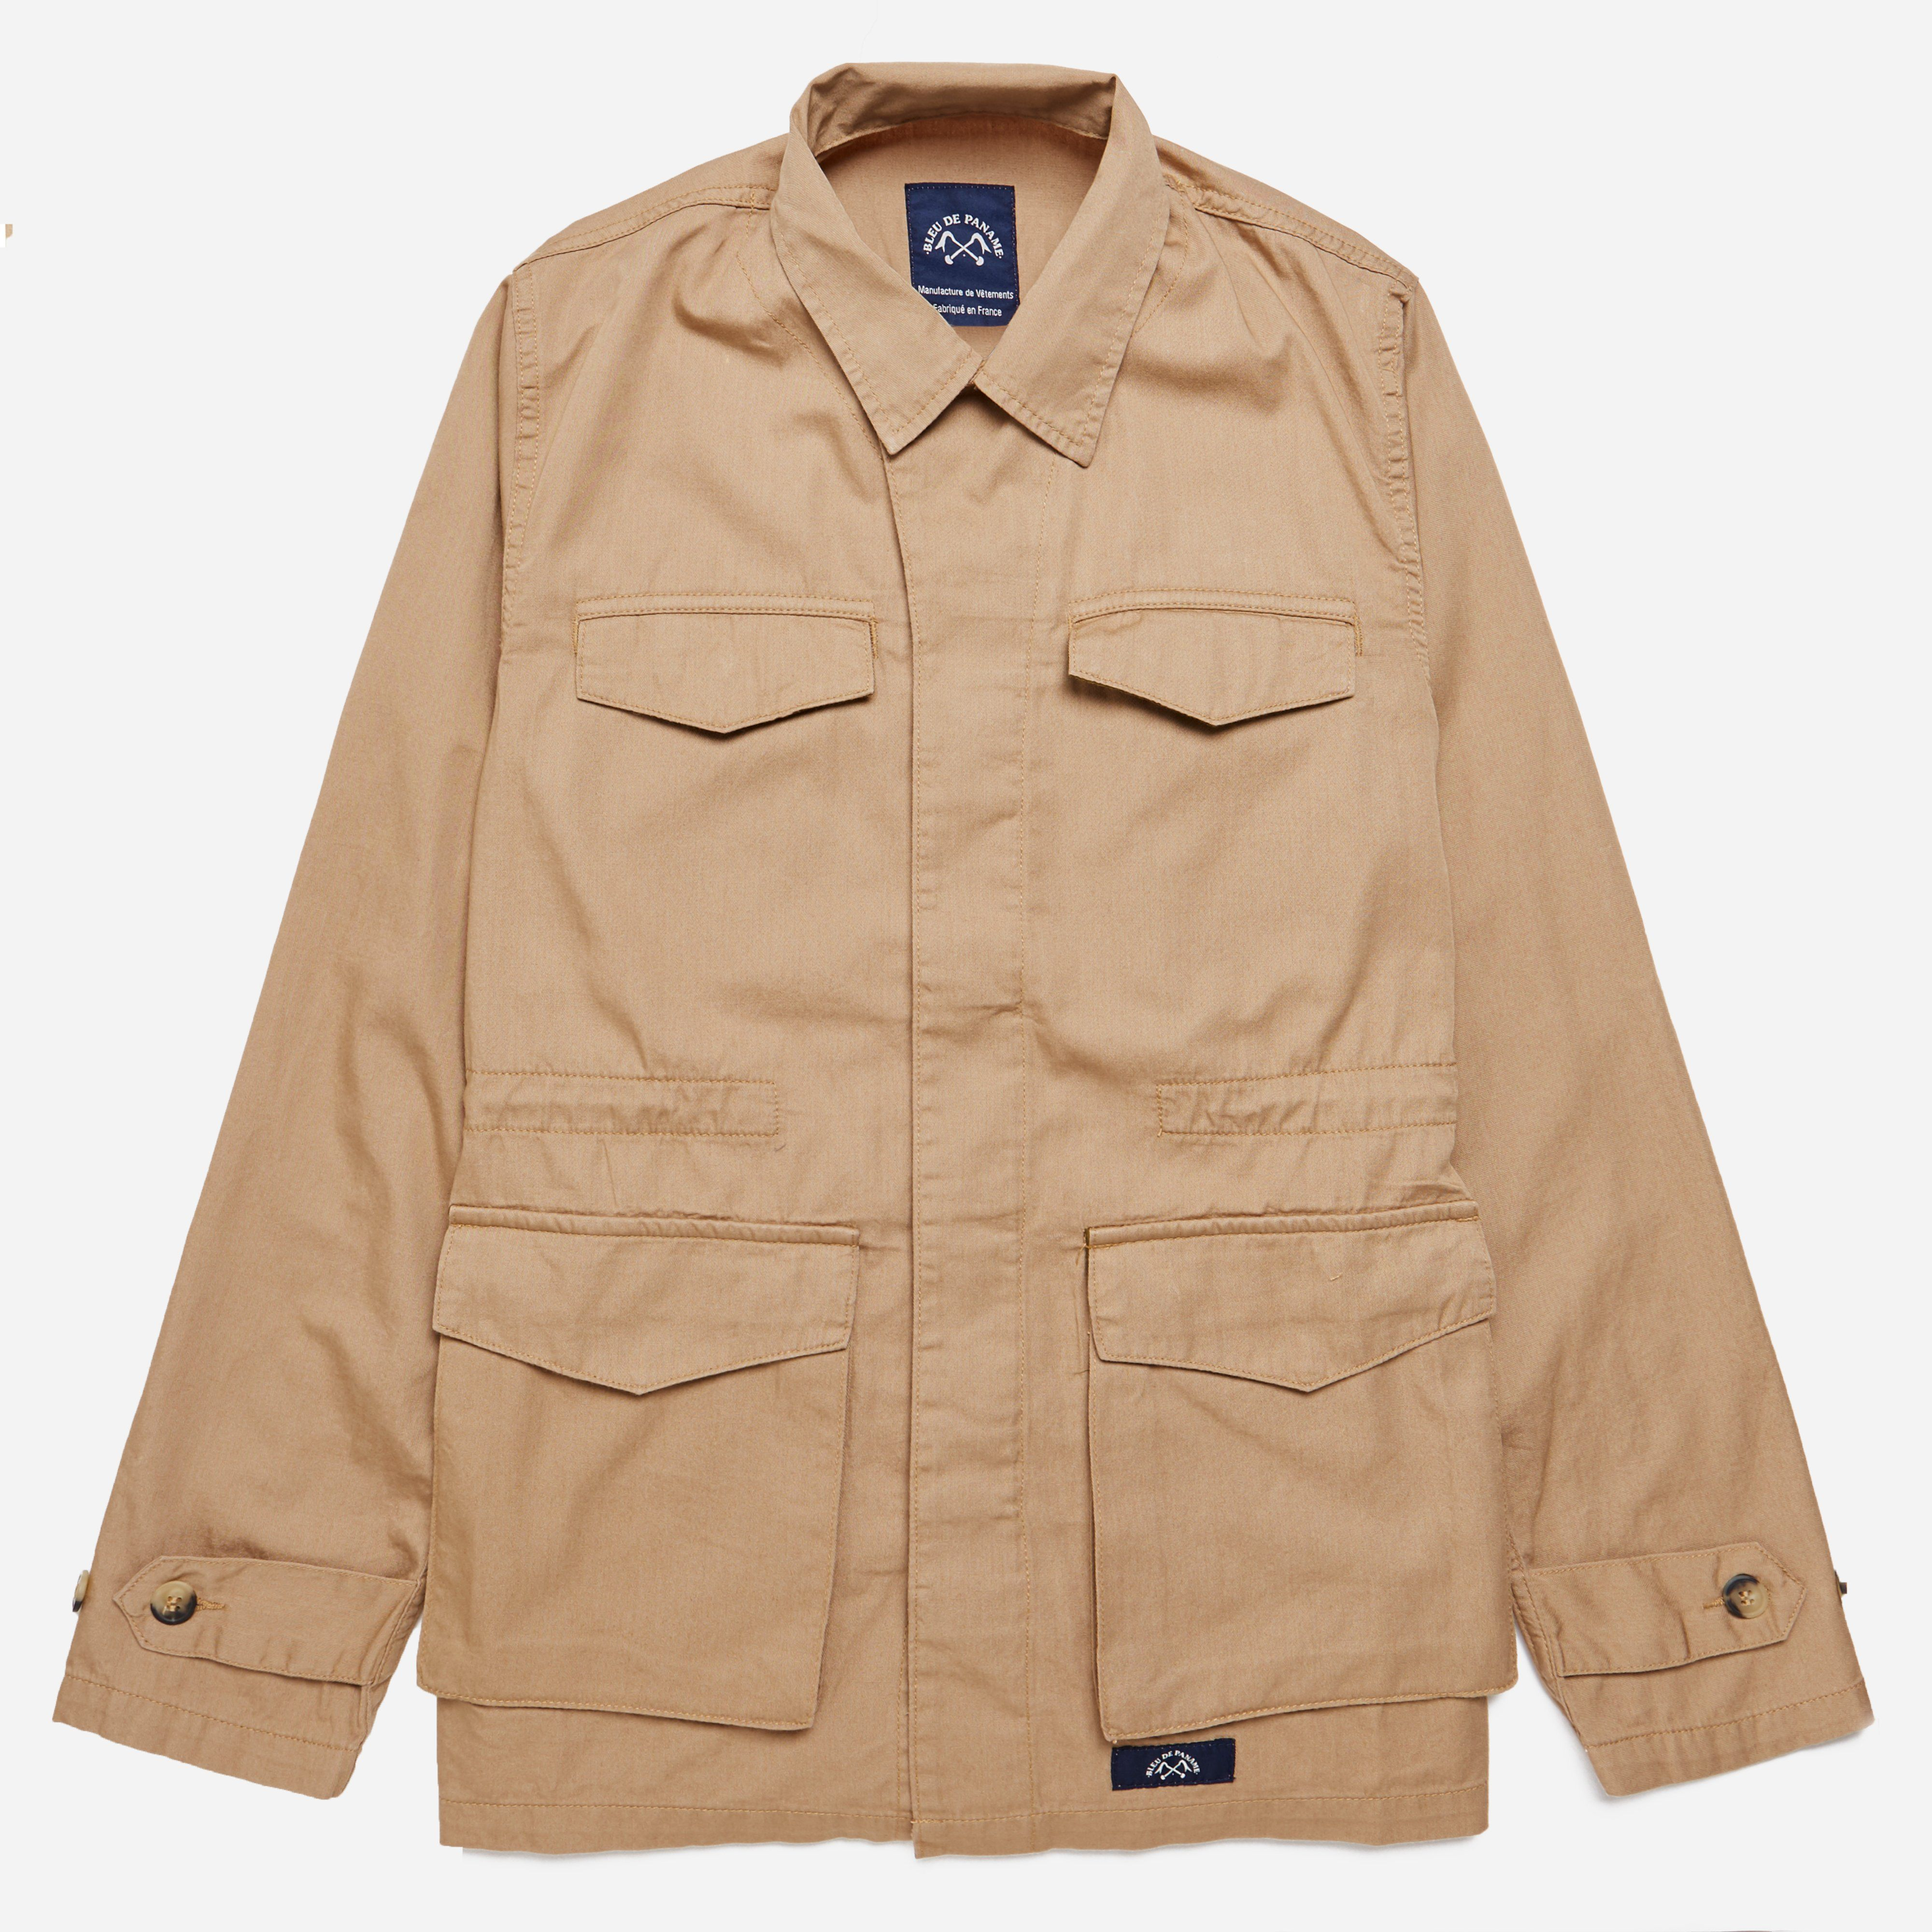 Bleu De Paname M43 Jacket